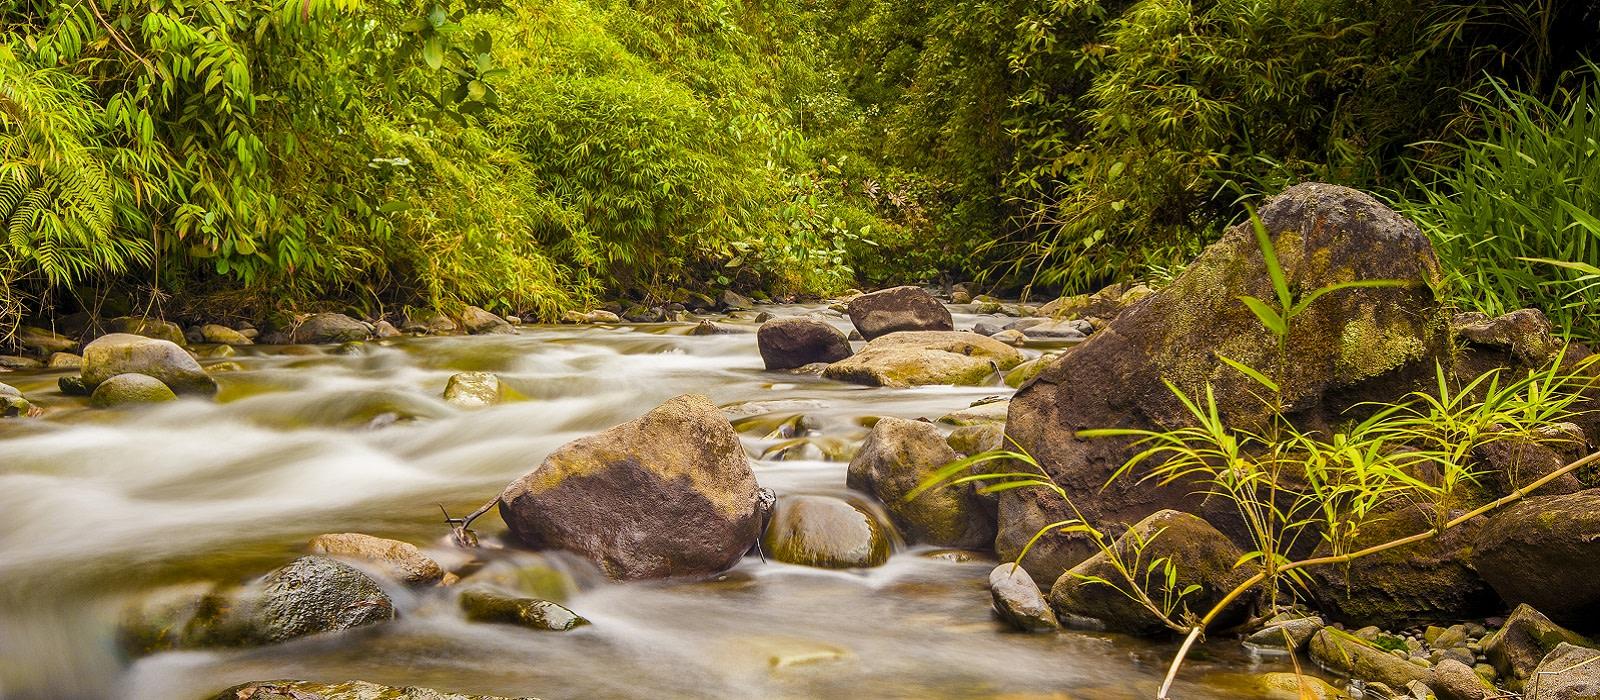 Reiseziel Bajos del Toro Costa Rica